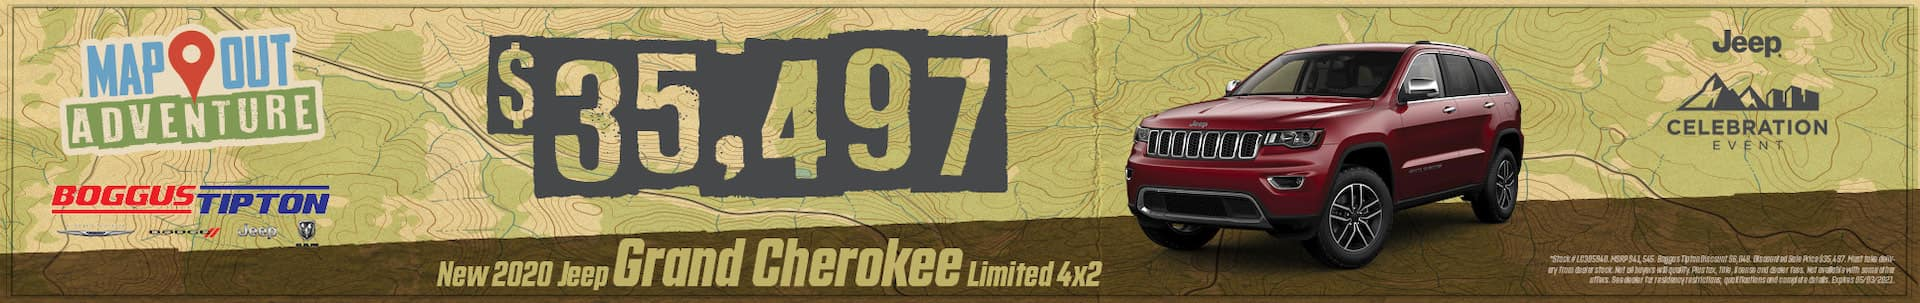 TiptonCDJR-1930X305-GRAND_CHEROKEE